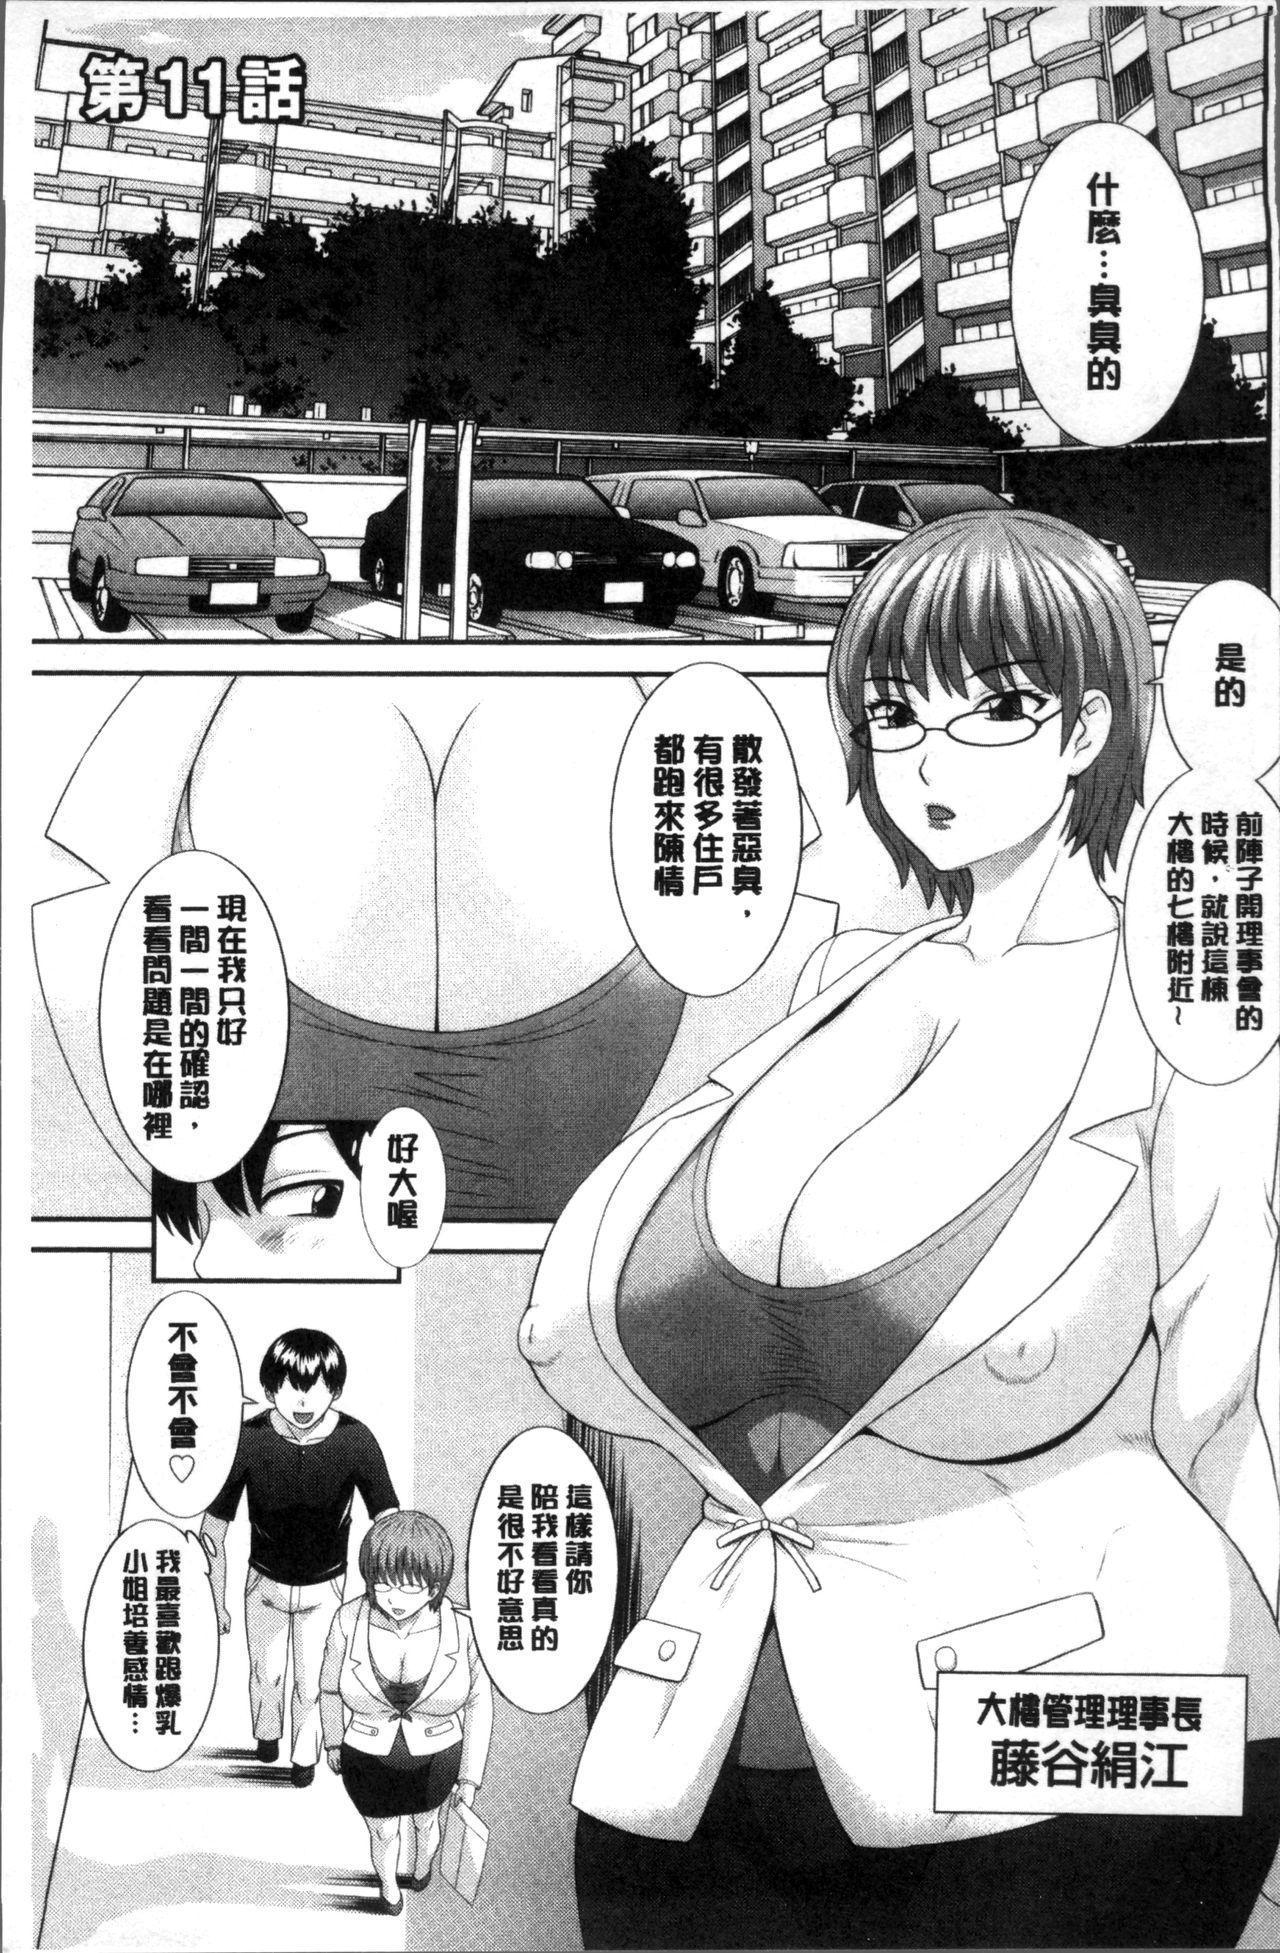 [Kawamori Misaki] Innyuu Shufu no Futei Ganbou - Oku-san to Kanojo to 2 | 淫乳主婦的不貞願望 和人妻也和女友❤2 [Chinese] 24